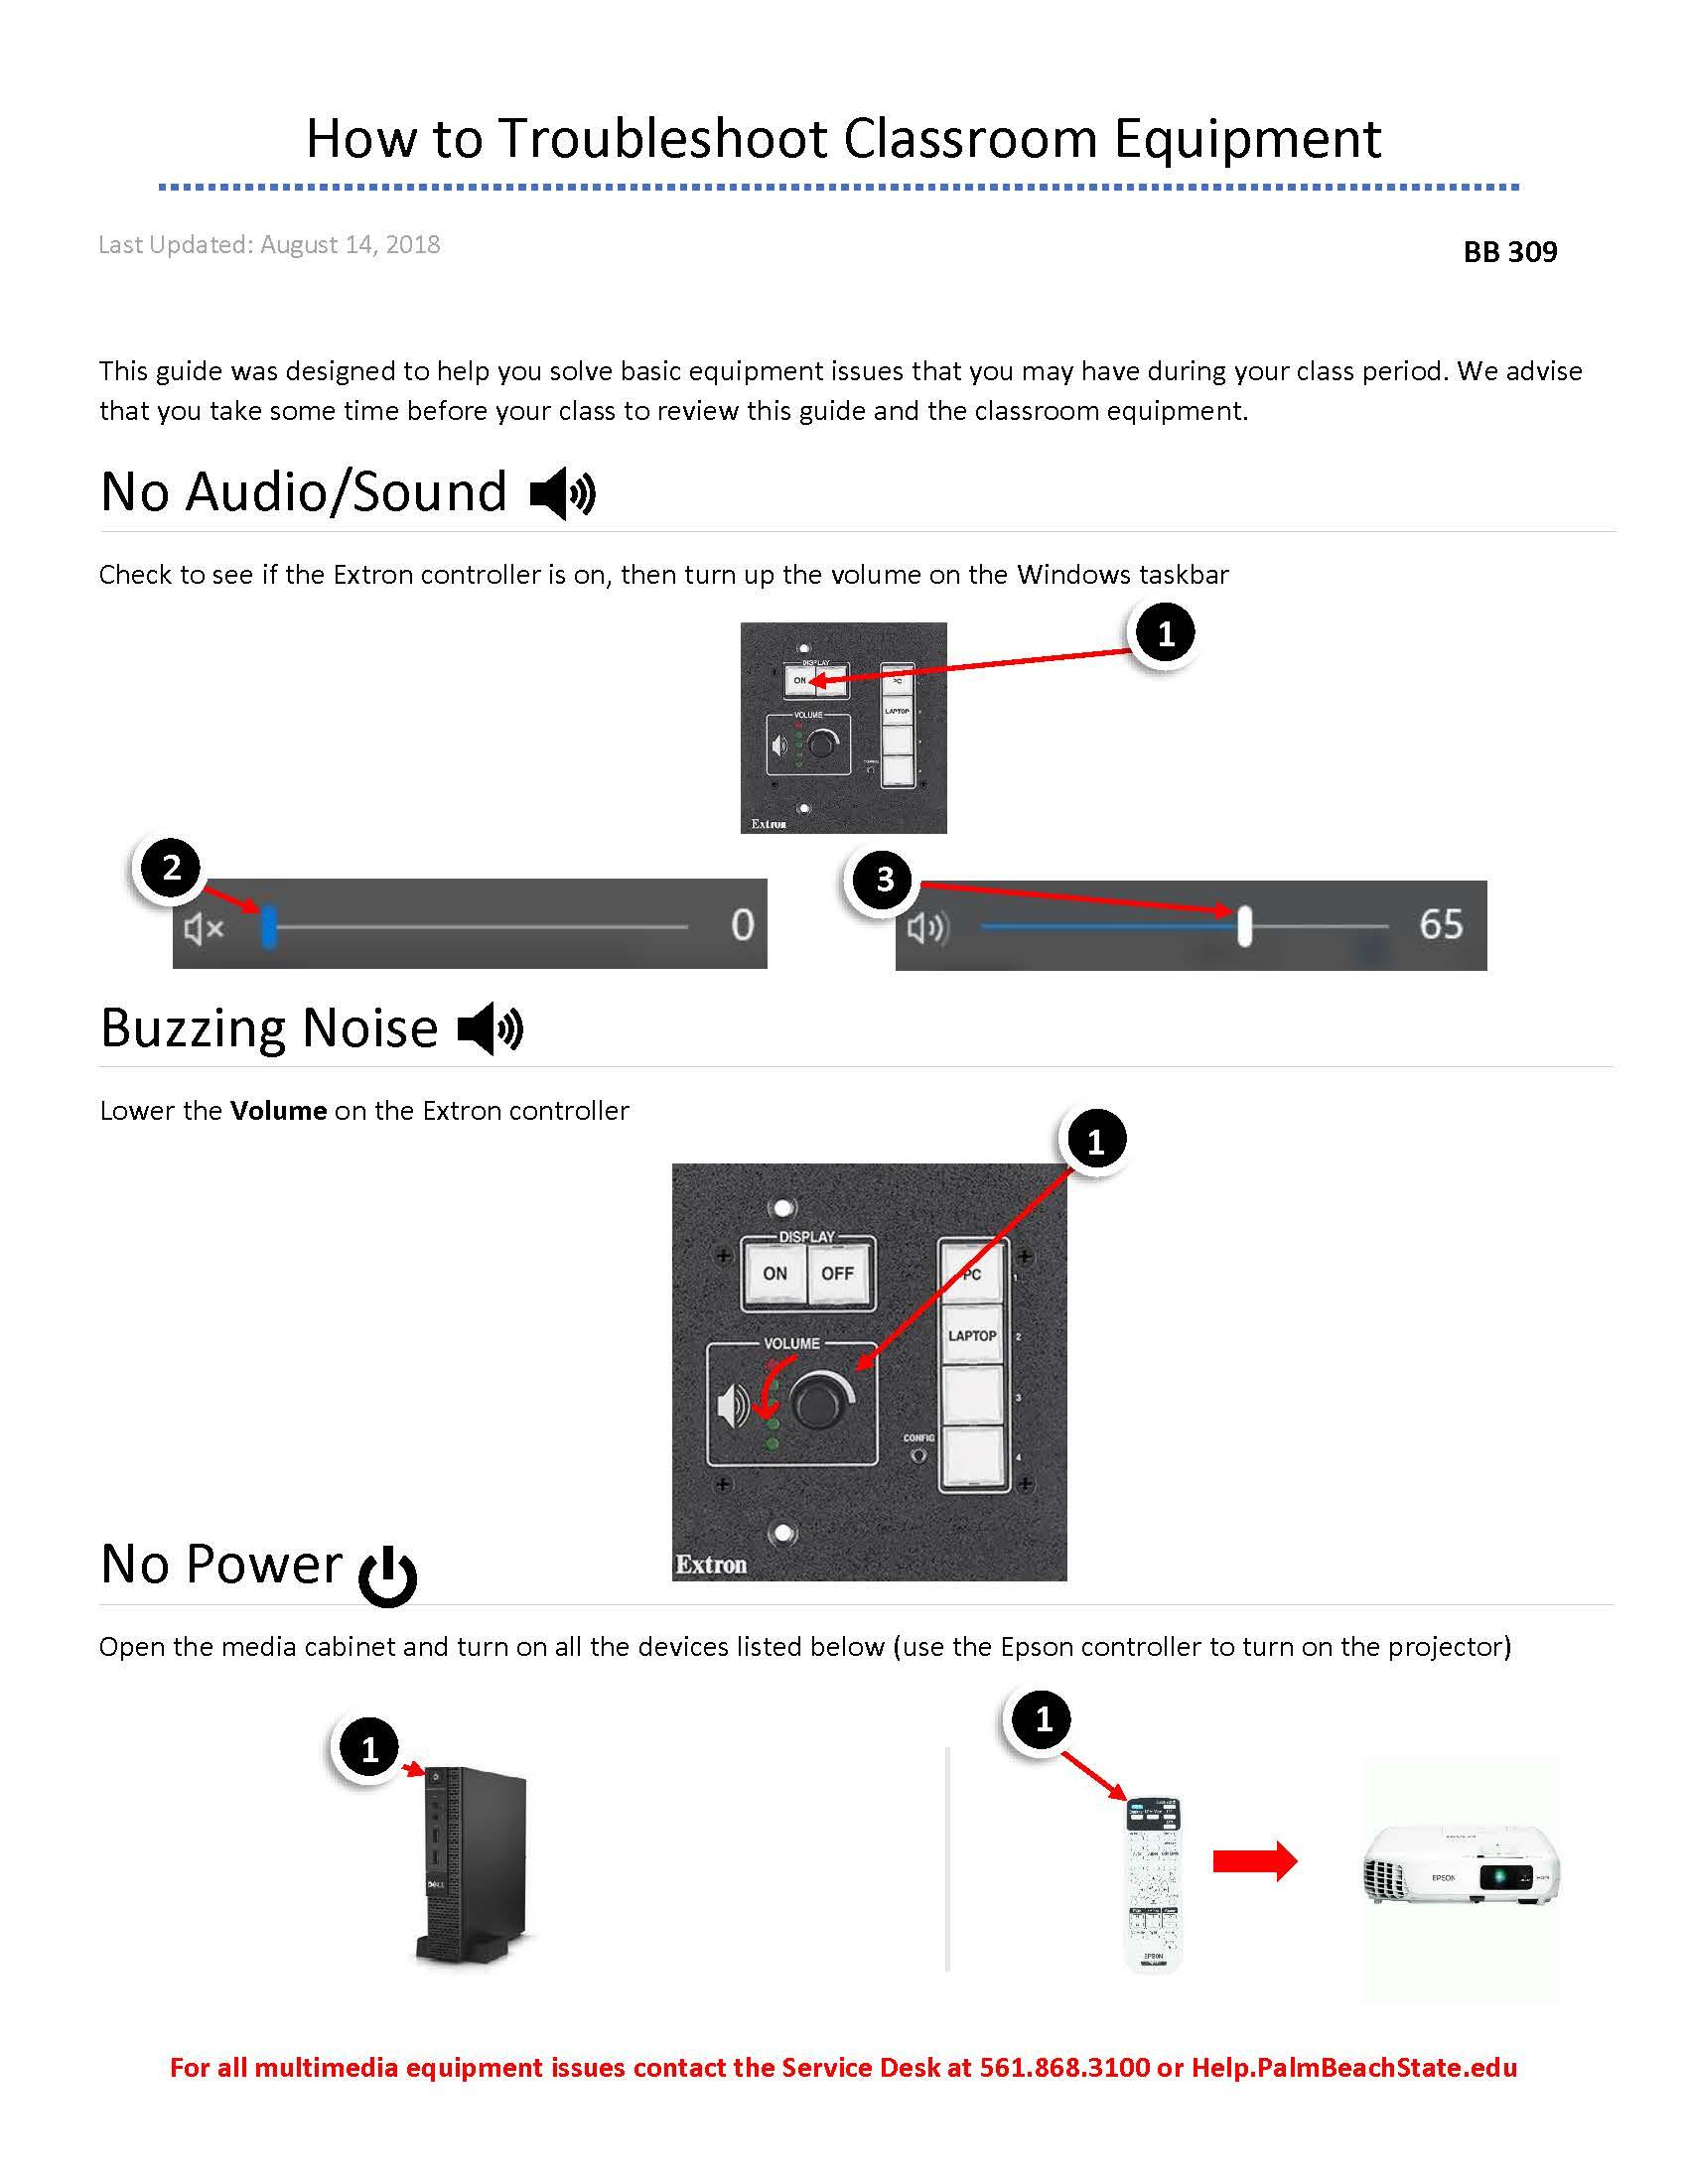 BB309 Multimedia Guide